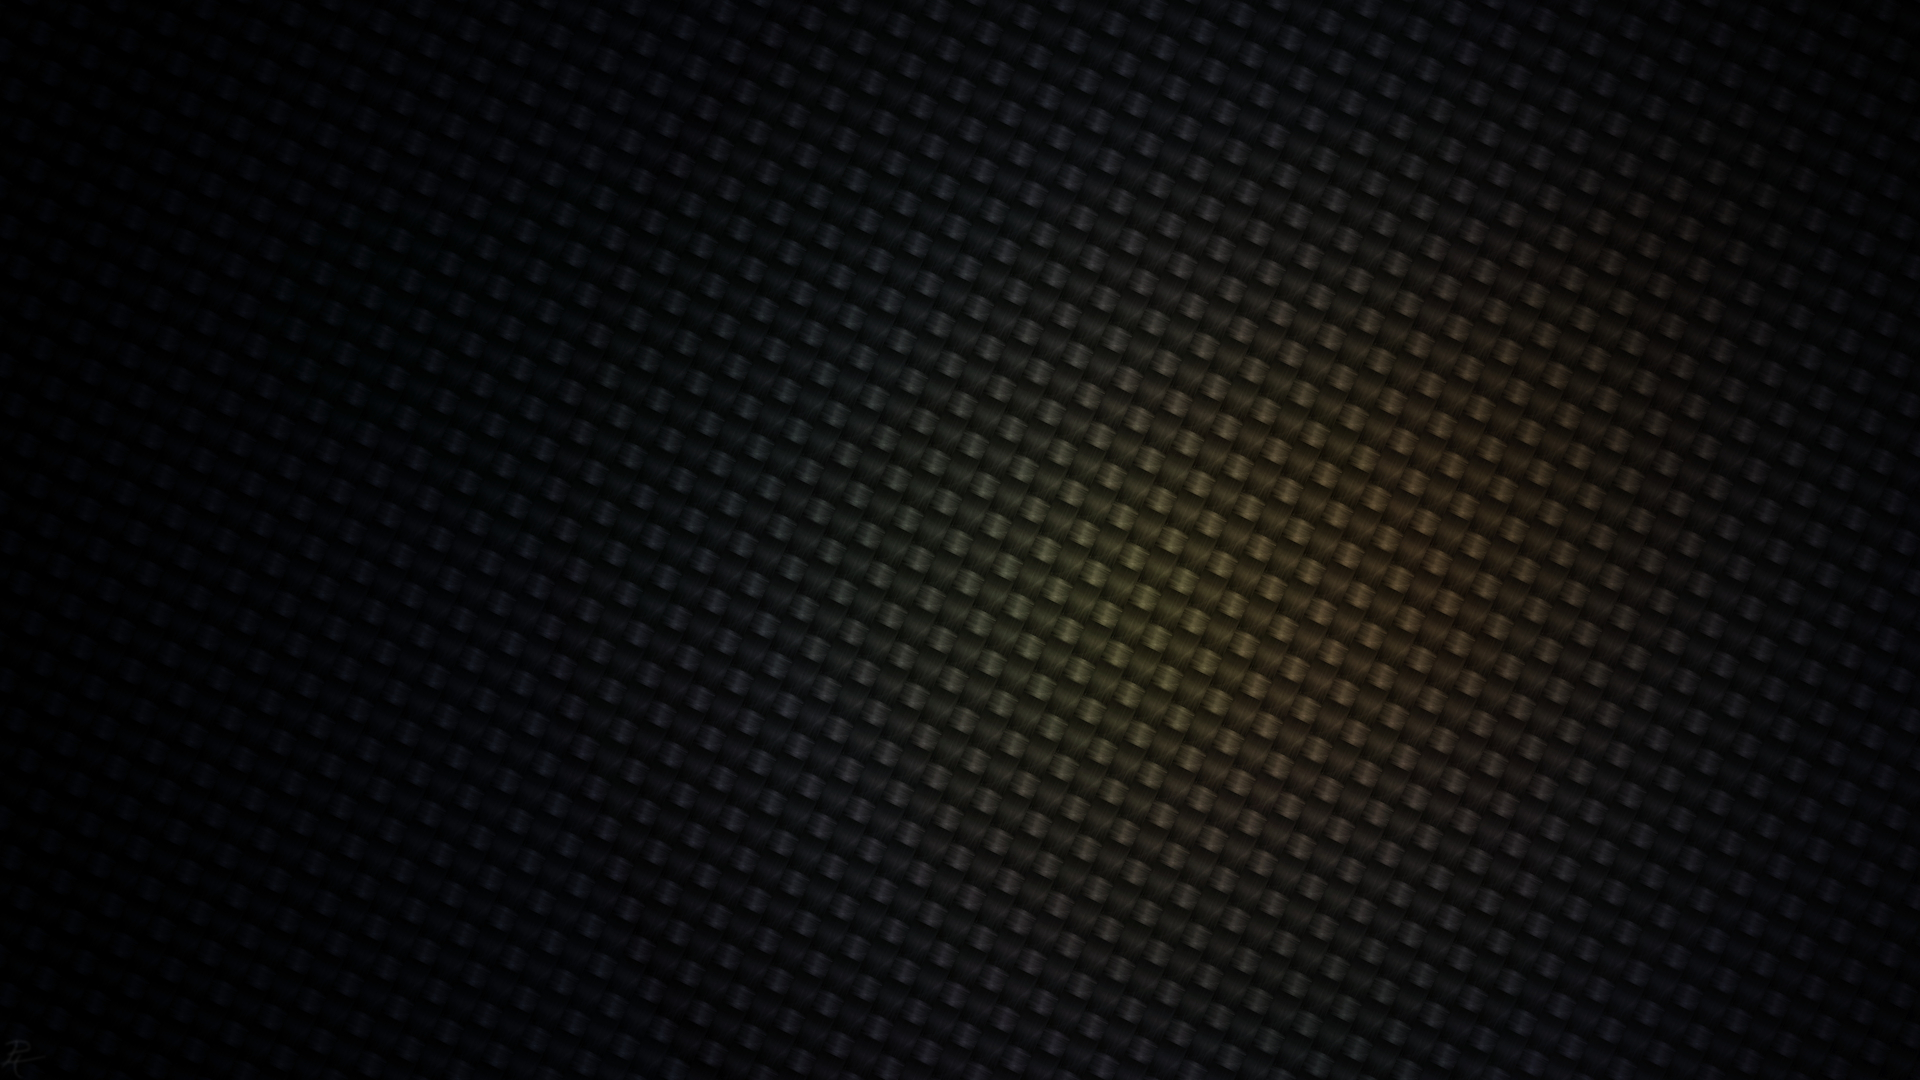 Photo Collection Carbon Fiber Hd Wallpaper